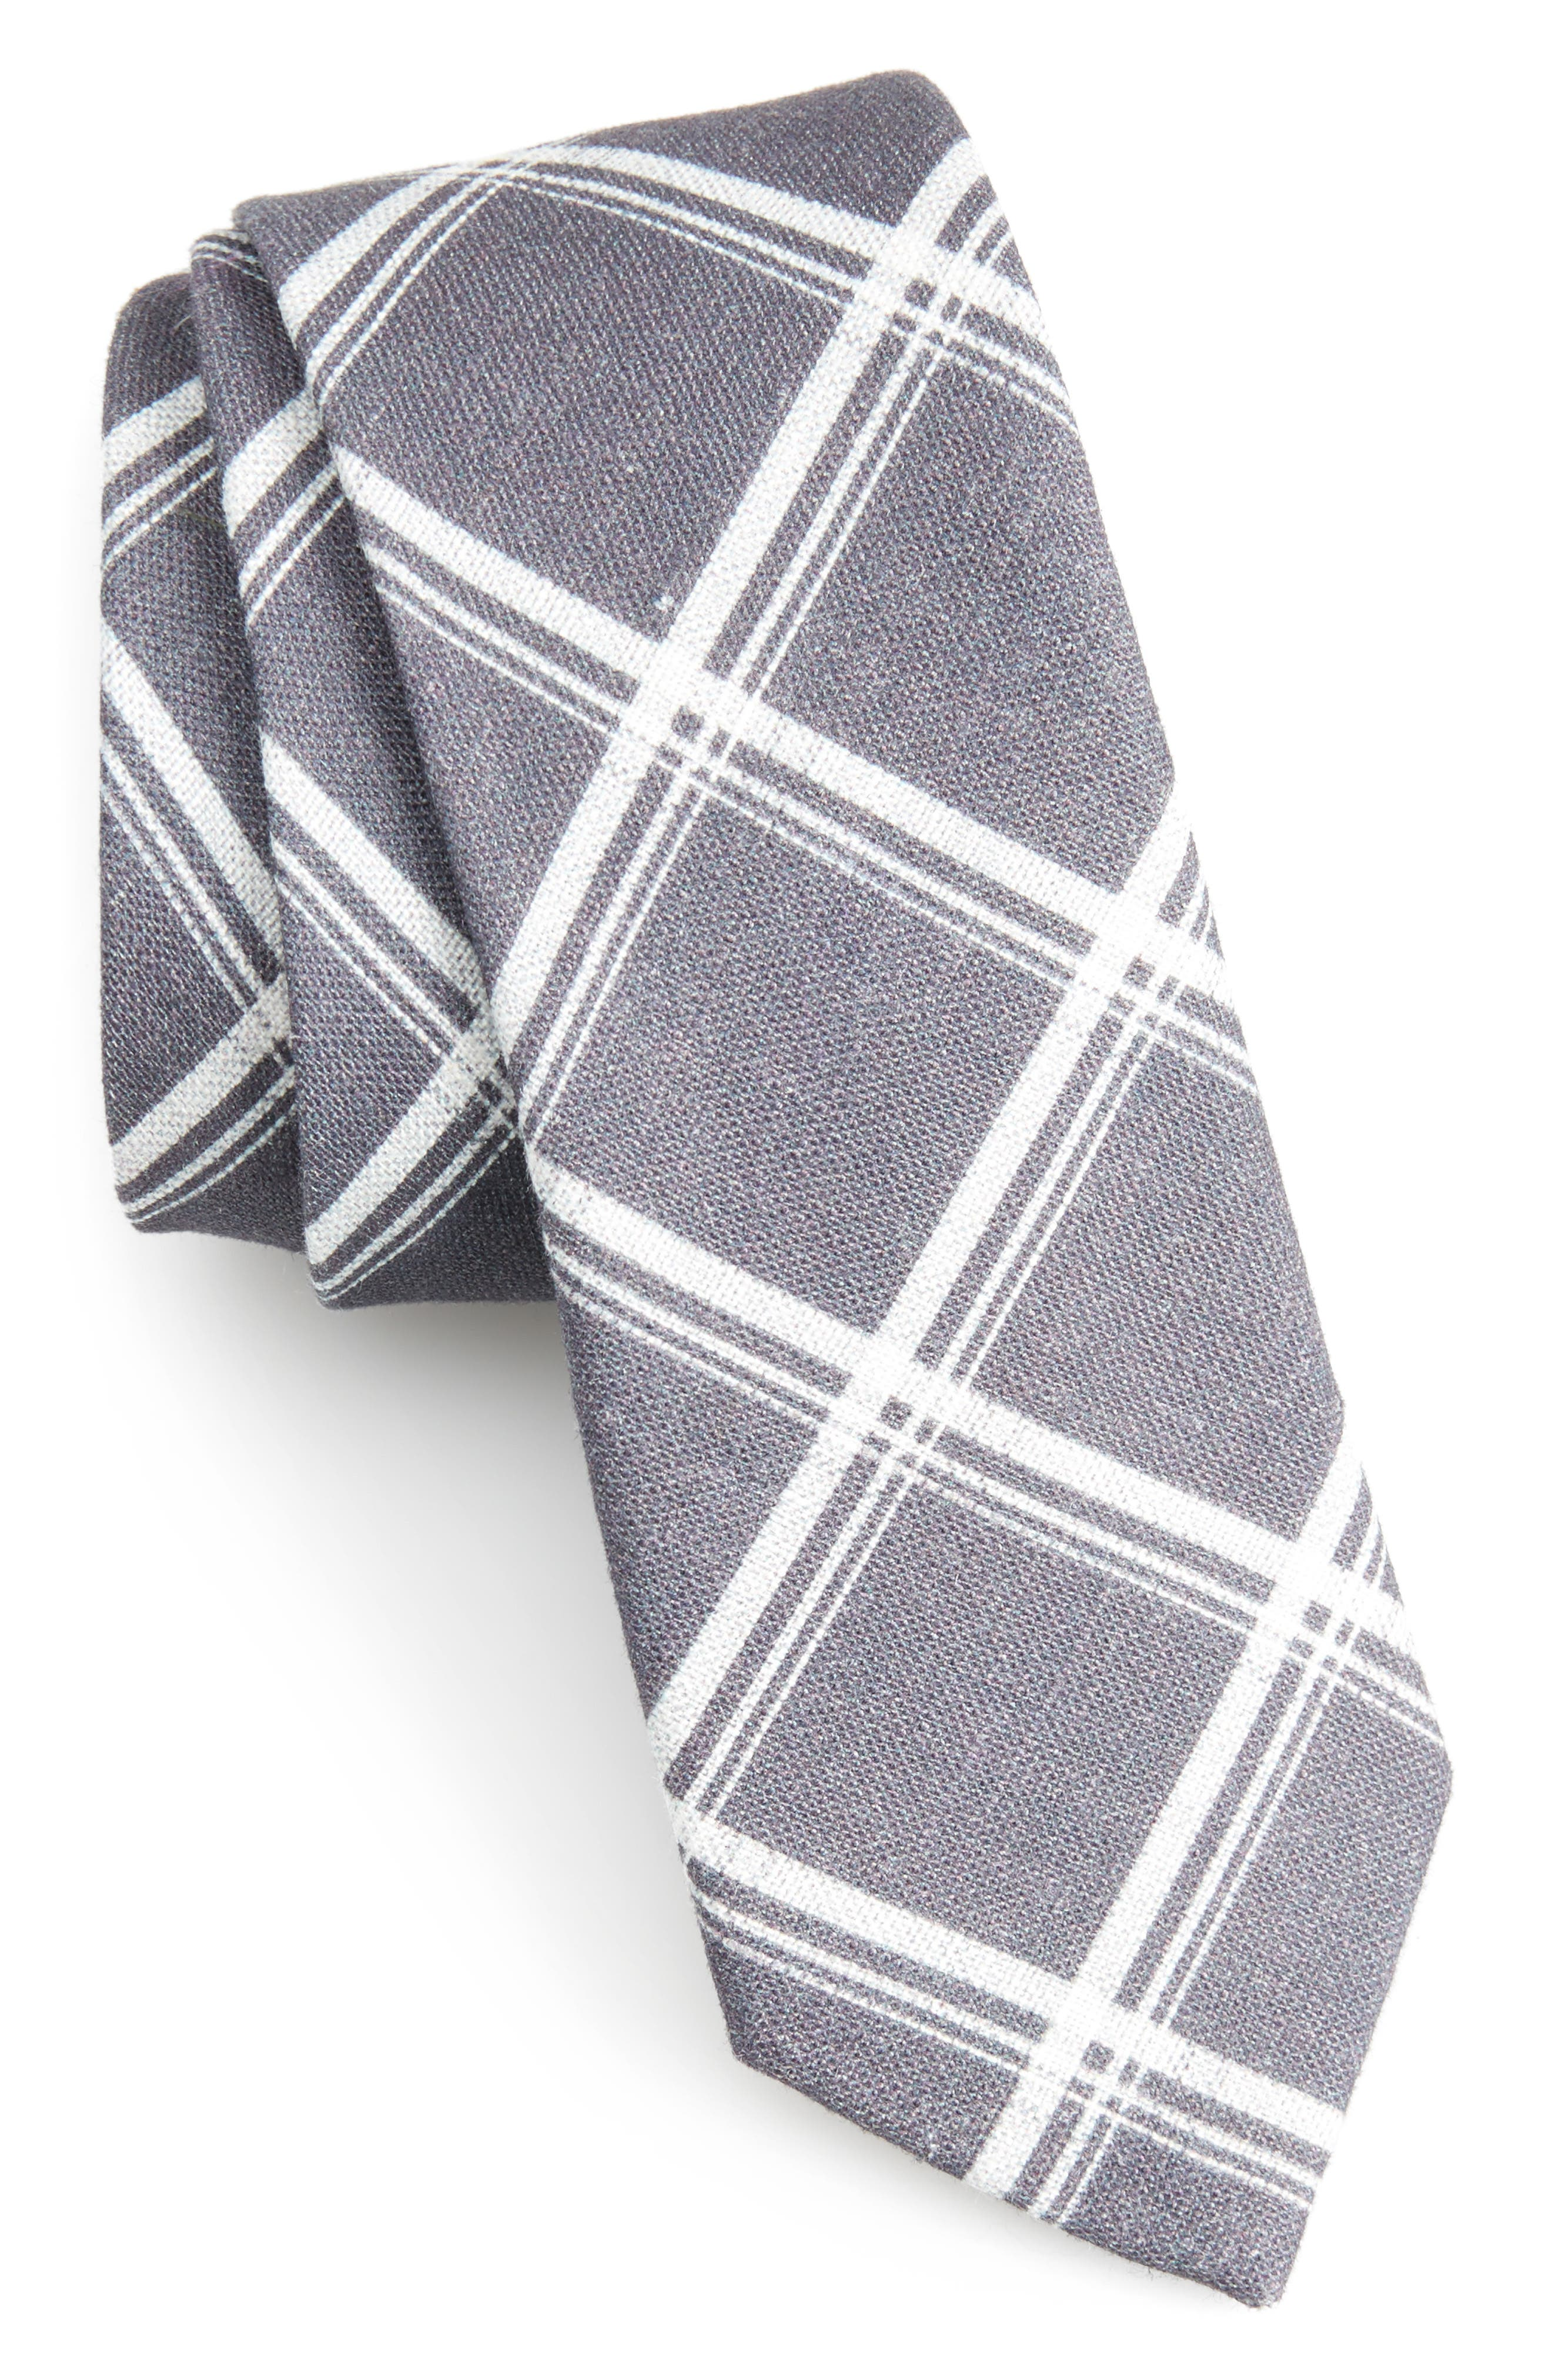 Main Image - The Tie Bar Jet Plaid Linen Skinny Tie